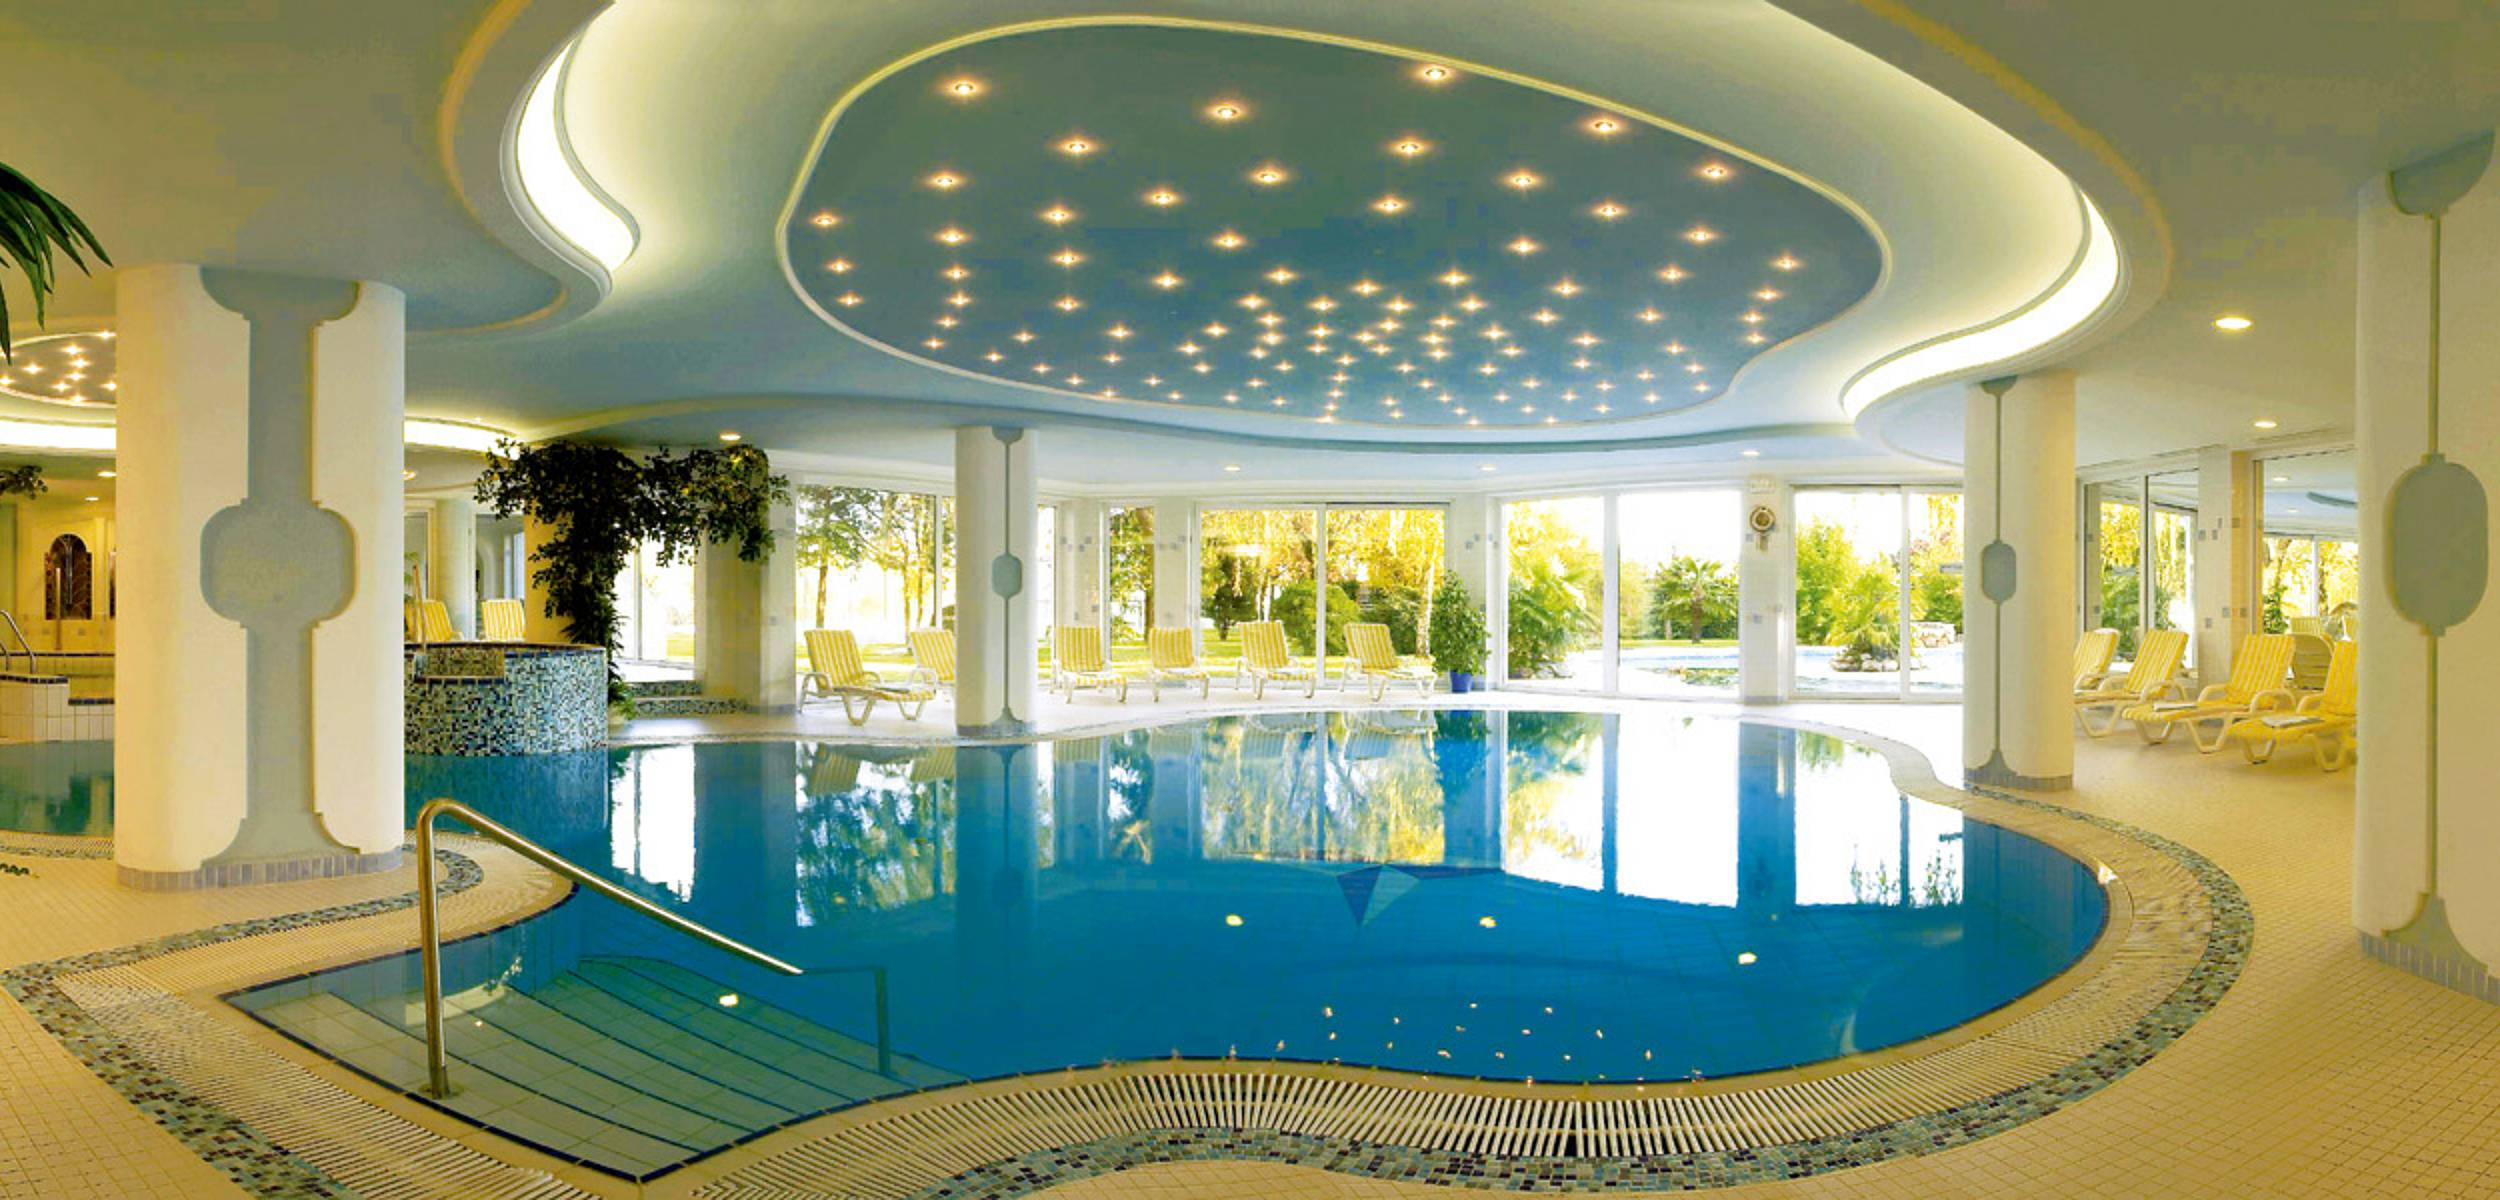 Hotels in meran und umgebung mit pool hotel ruipacherhof for Design hotel meran und umgebung